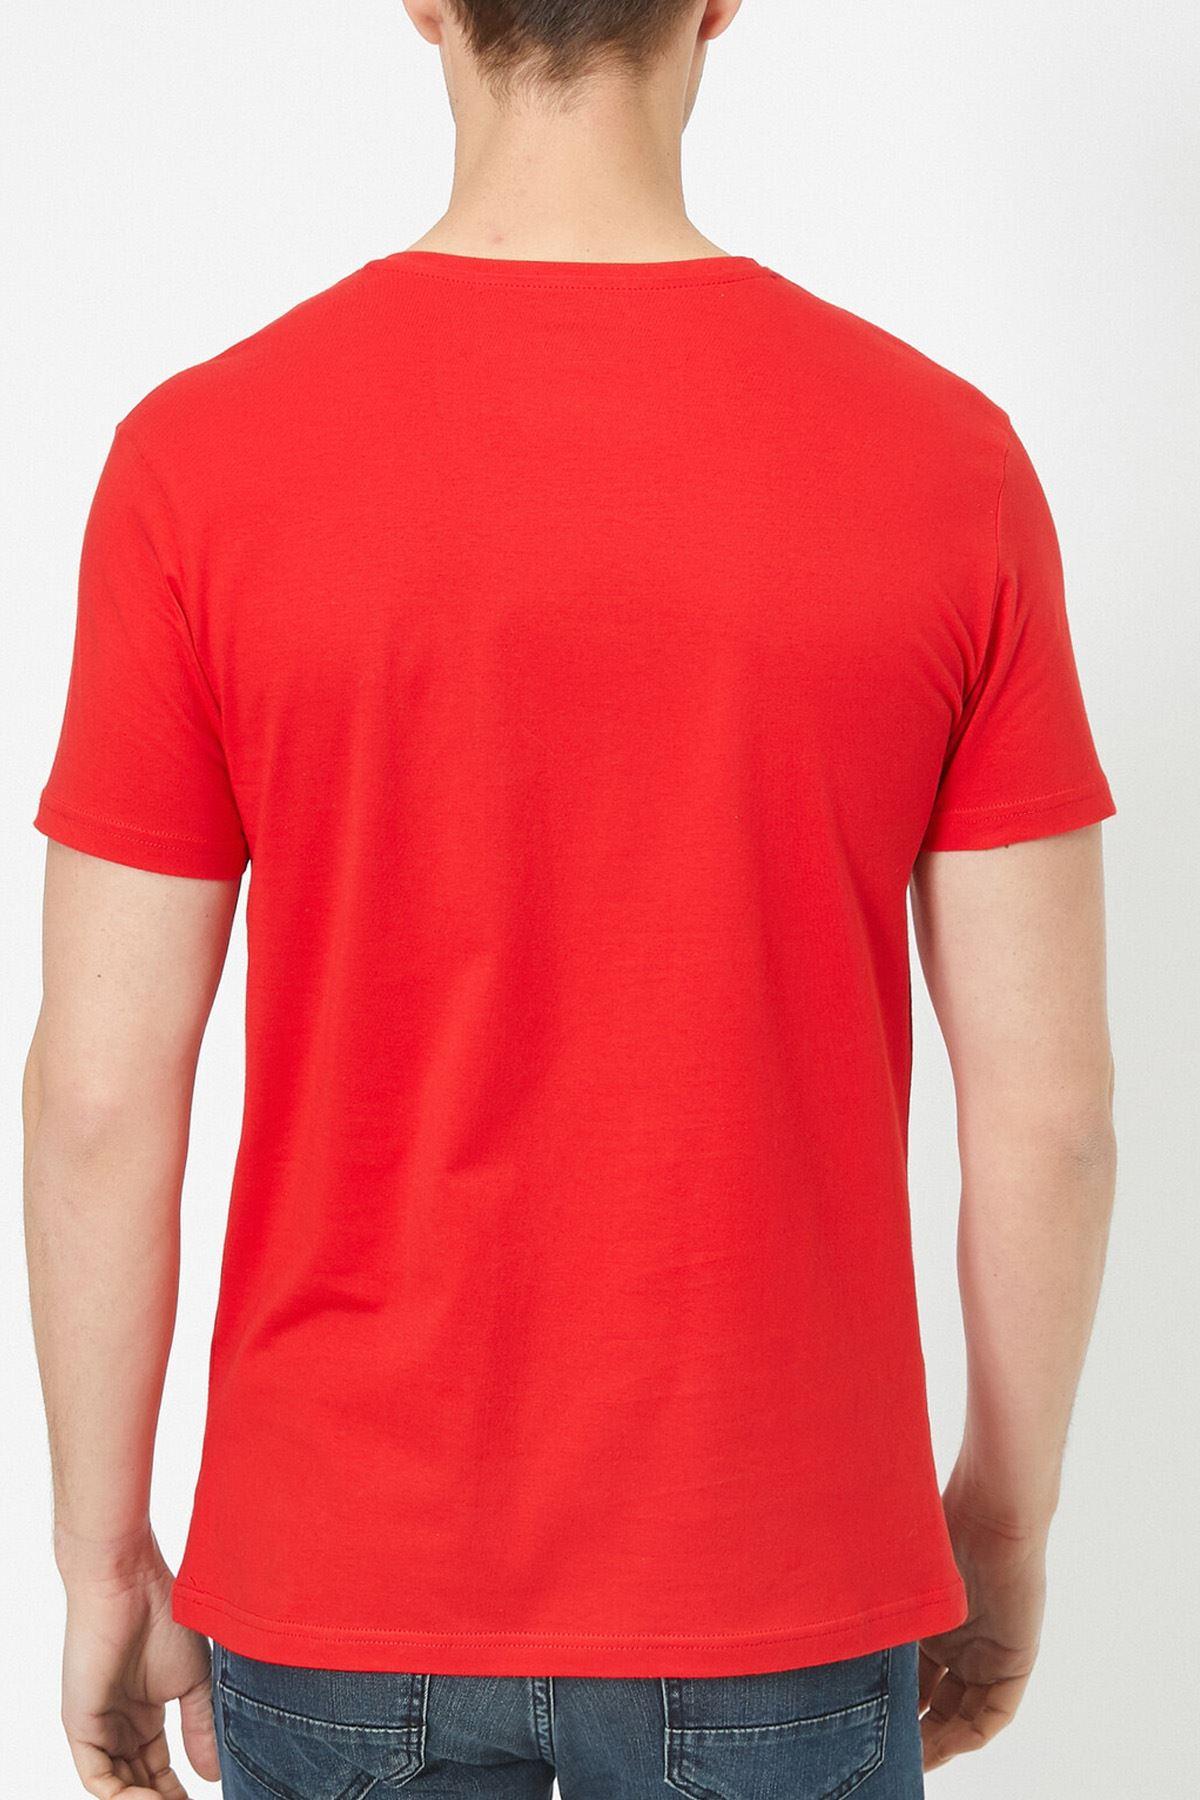 Naruto Anime 04 Kırmızı Erkek Tshirt - Tişört